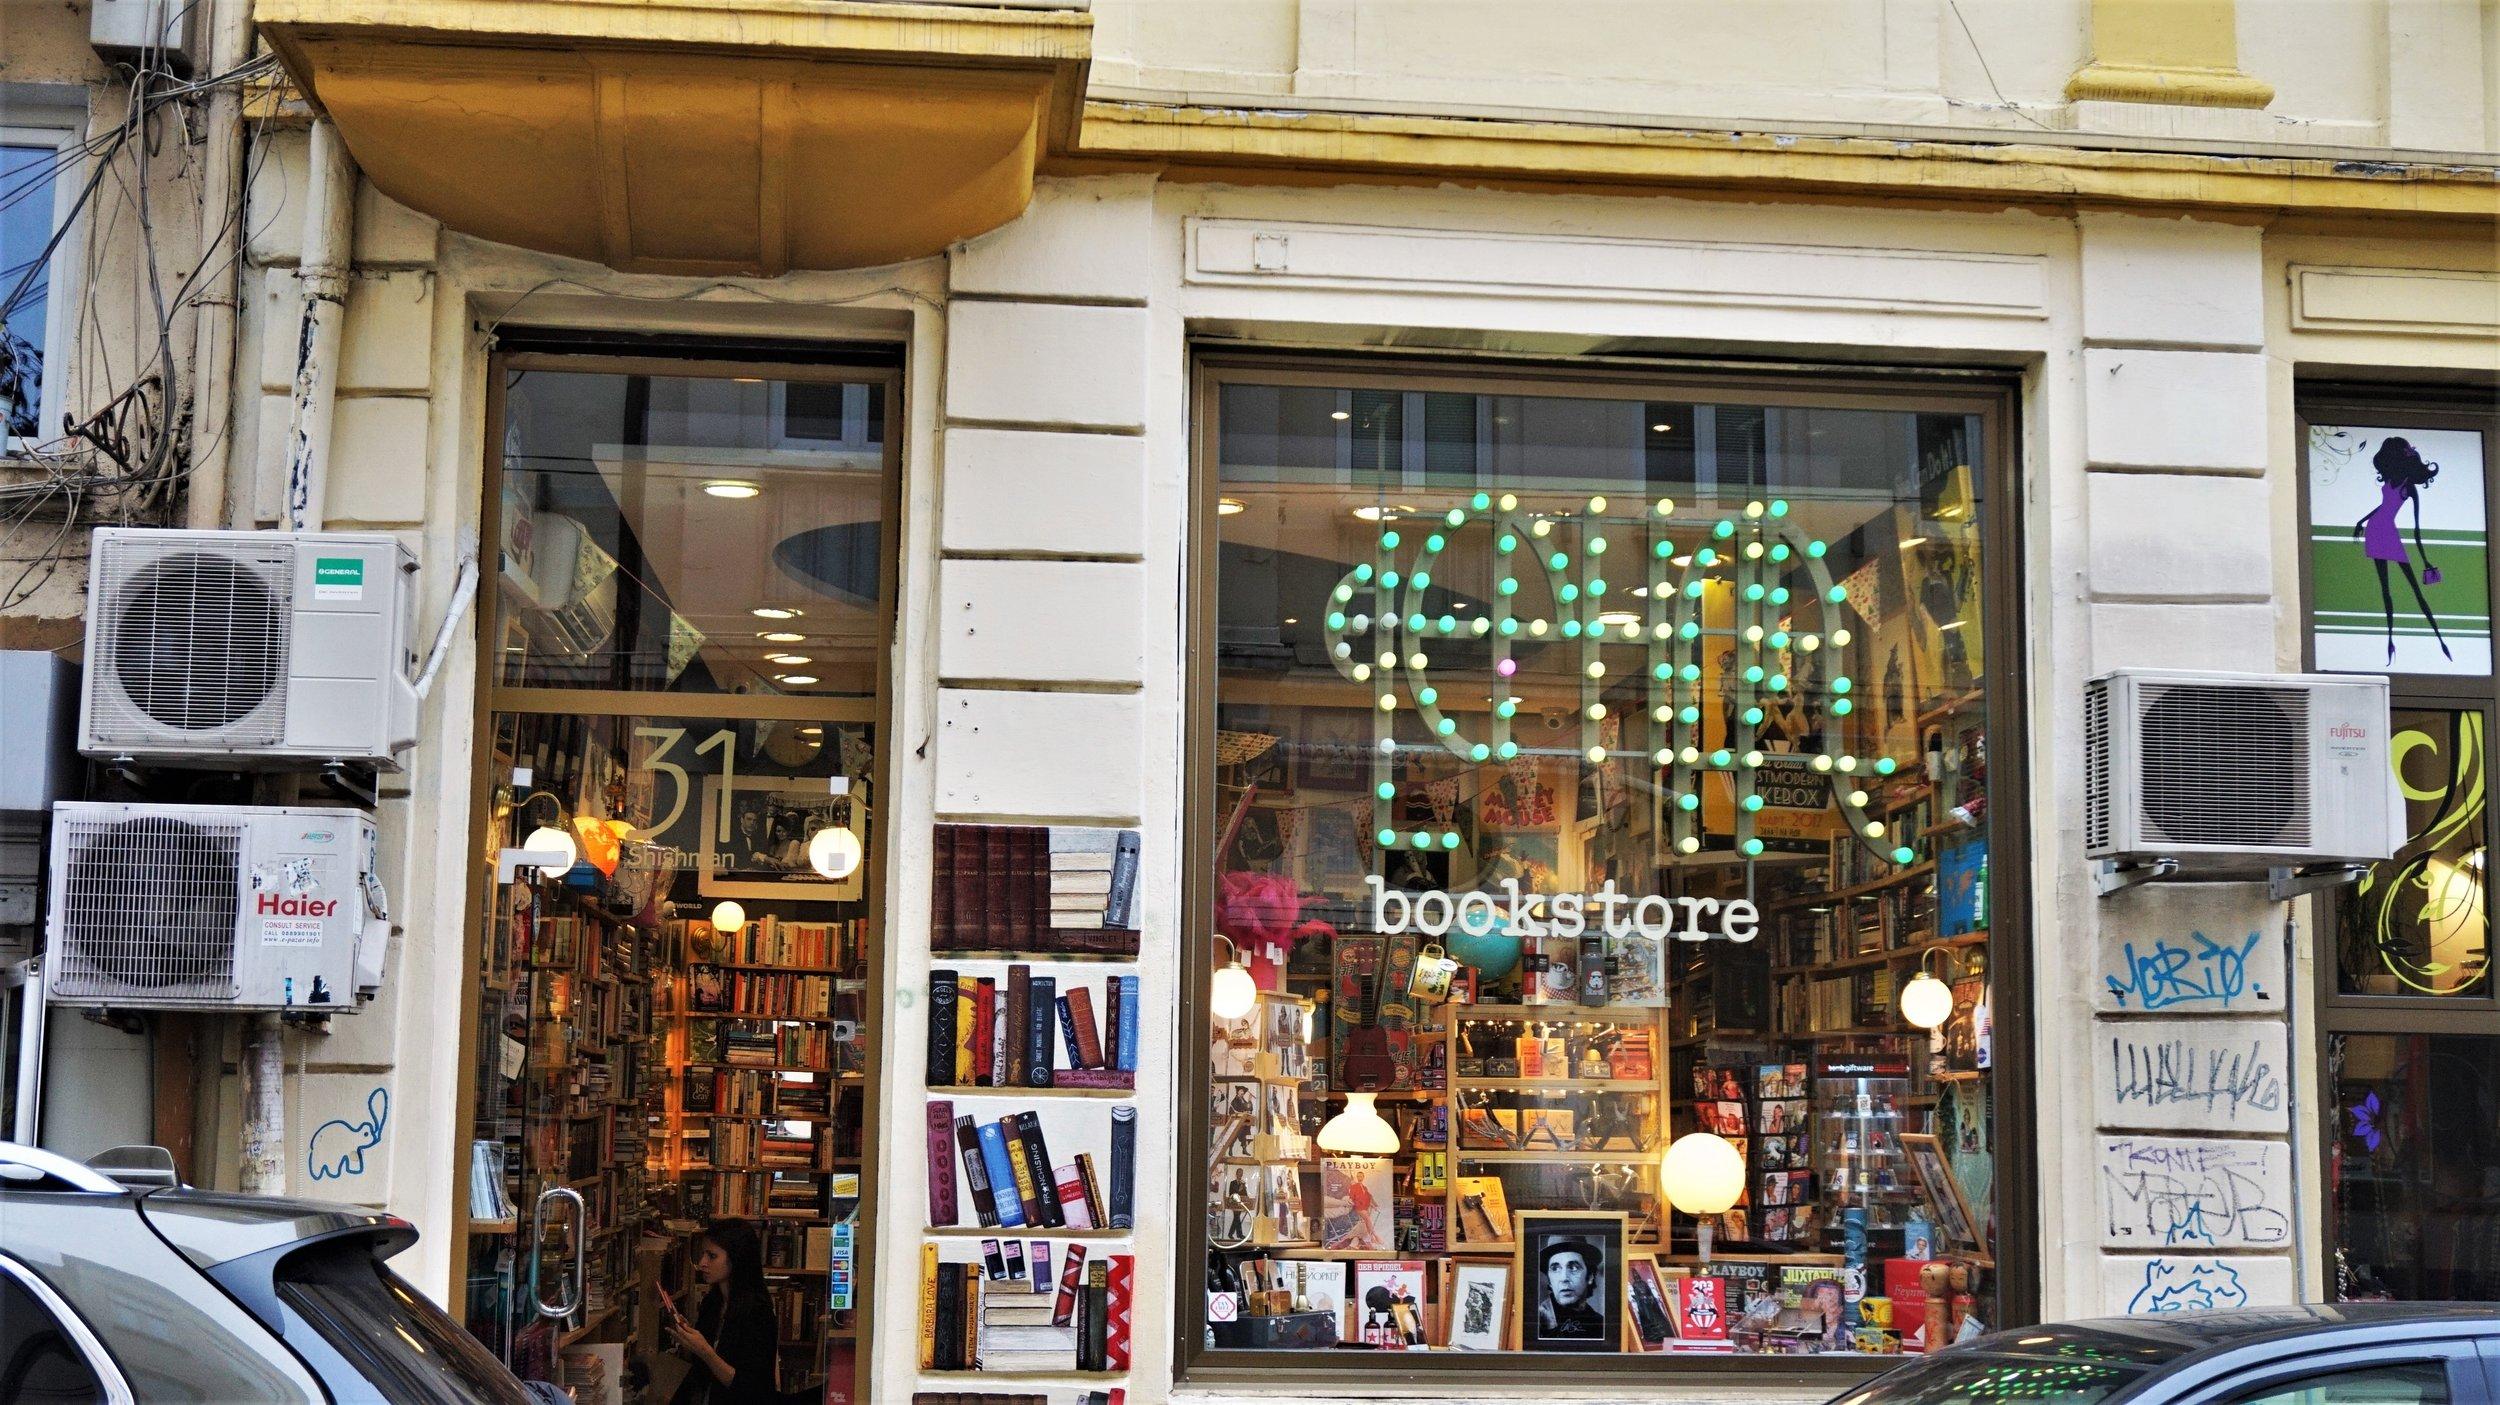 bookshop sofia.JPG